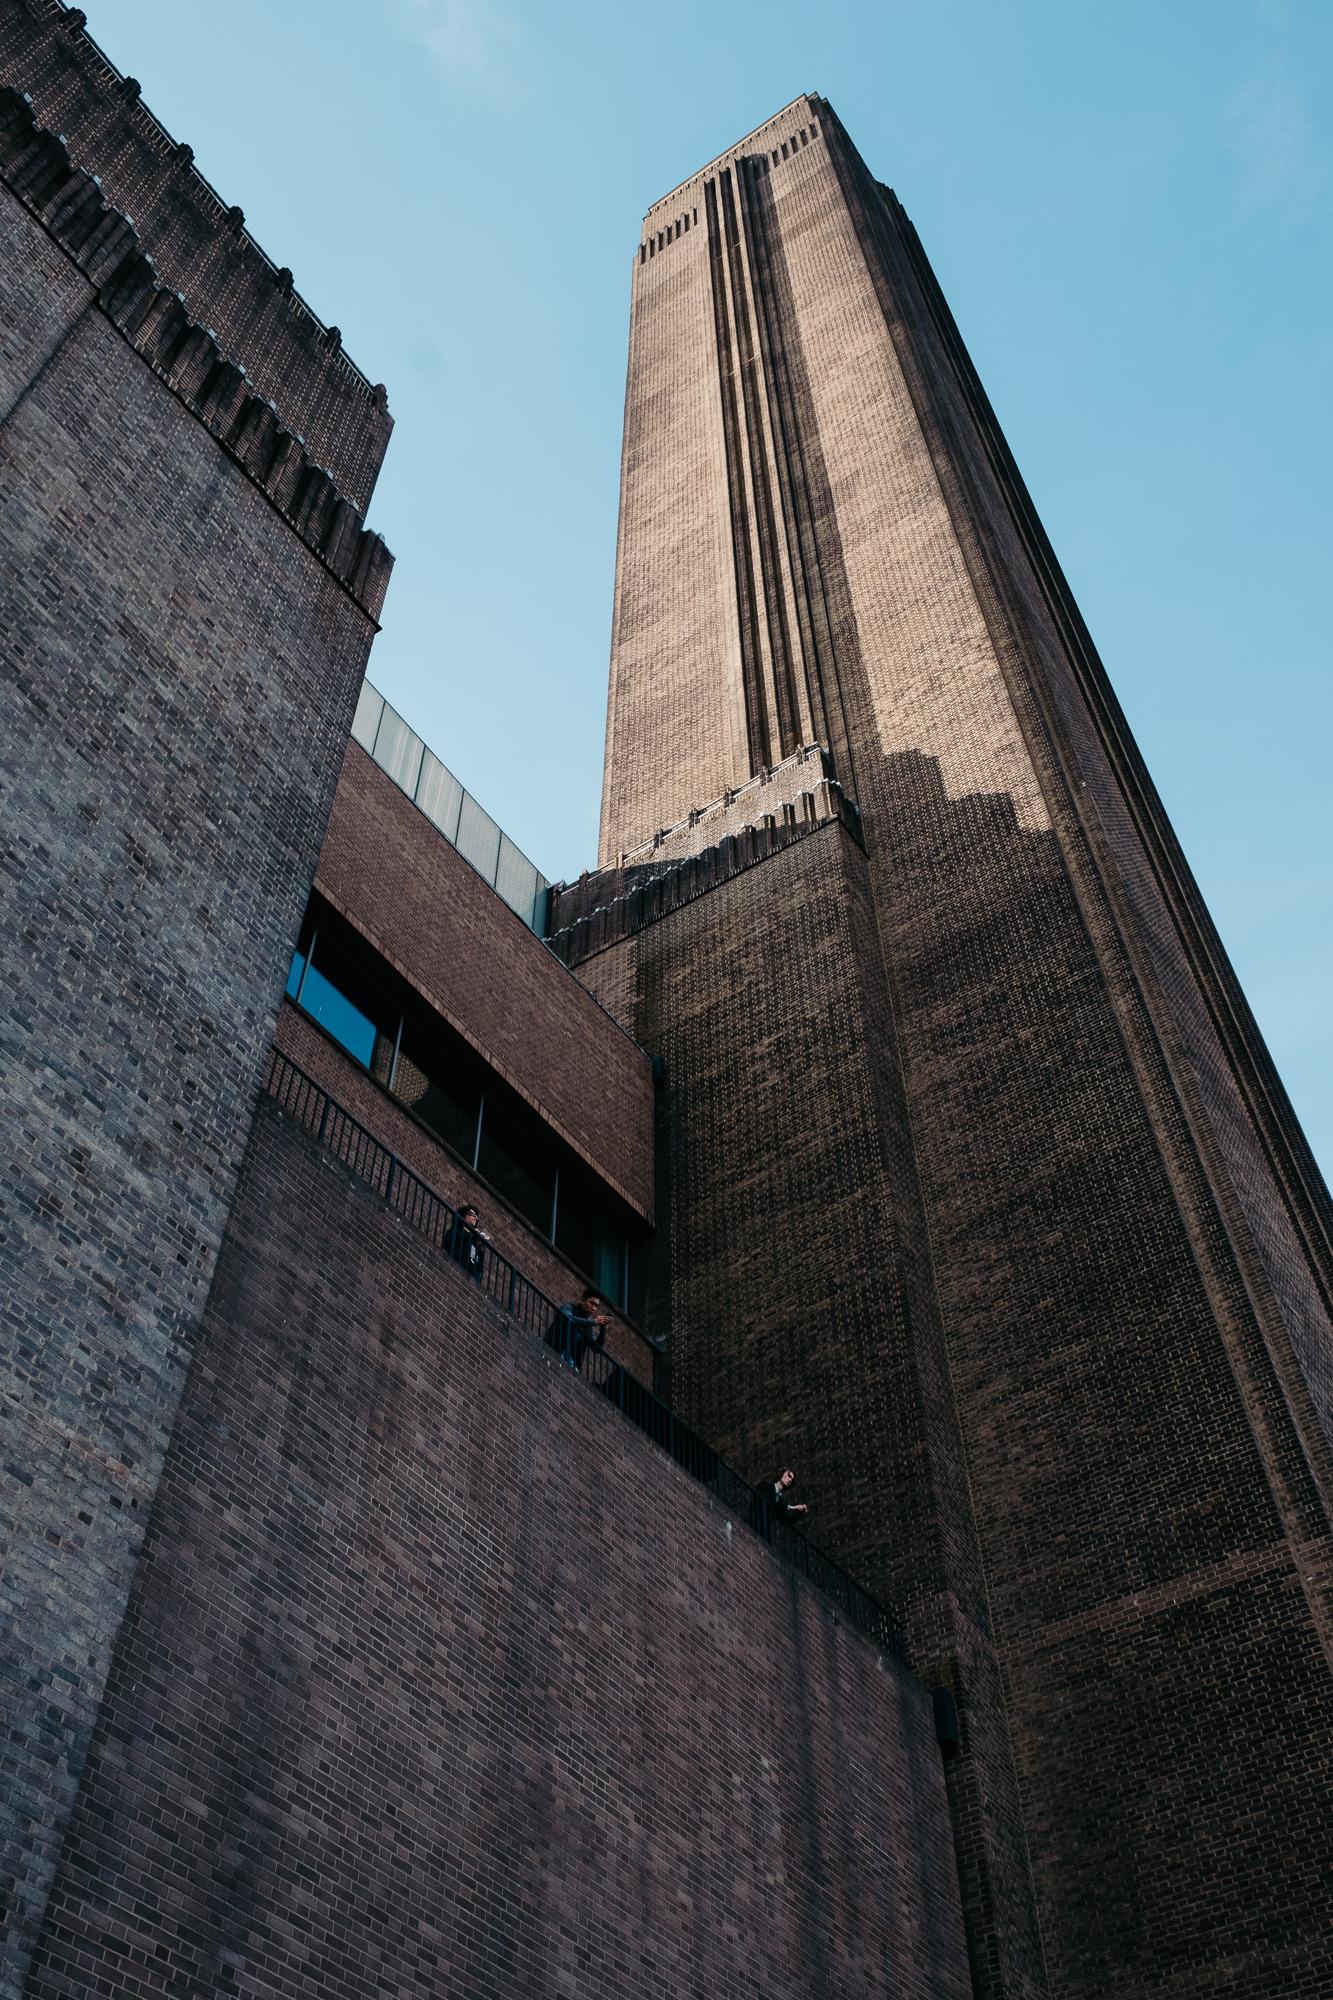 Tate Modern © Andrew Newson